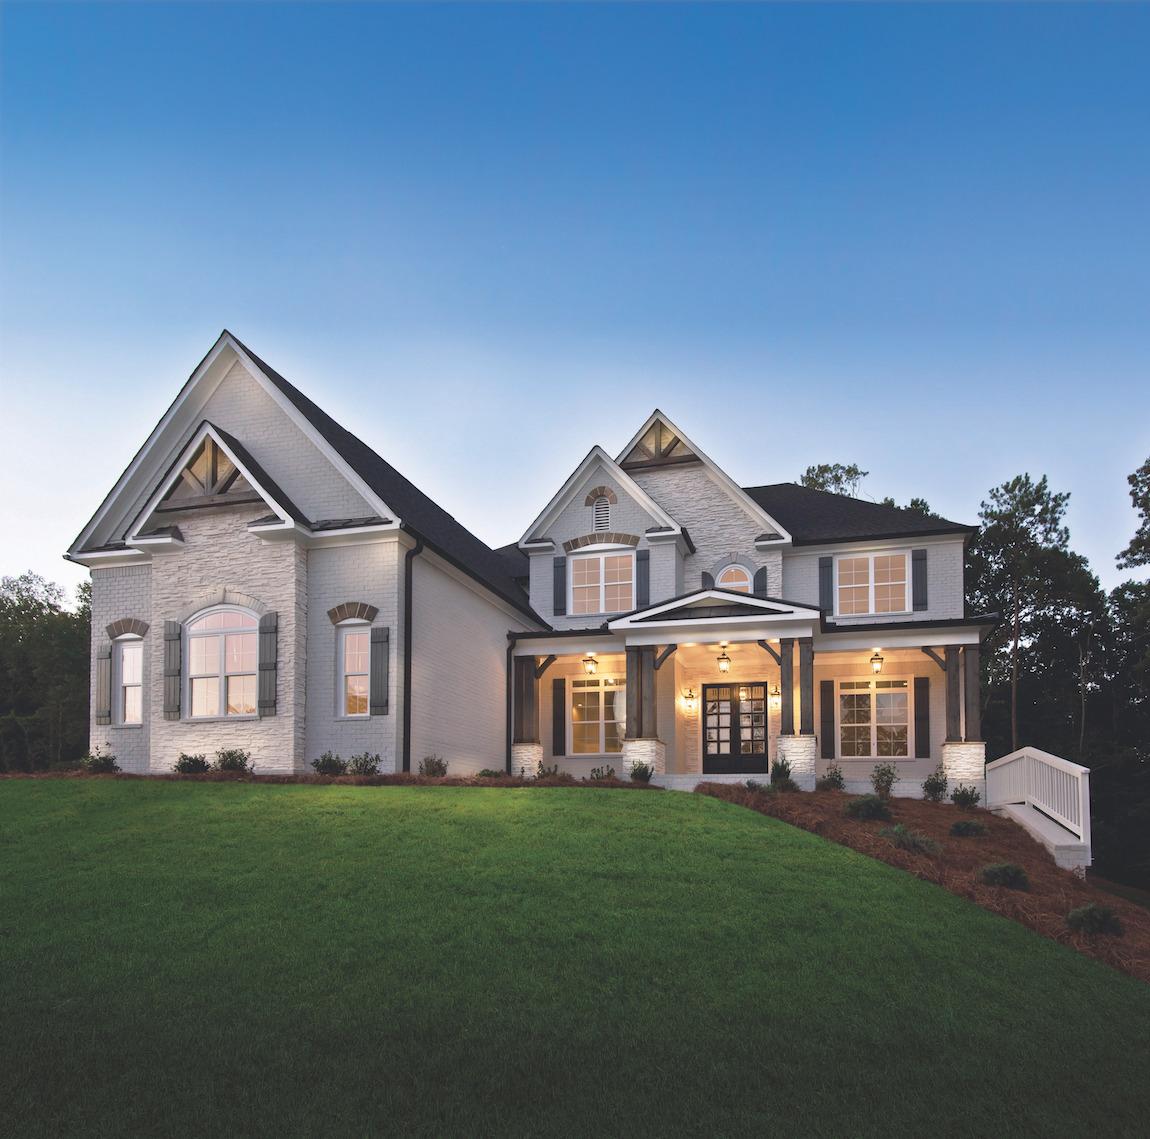 Luxury Toll home in Atlanta area